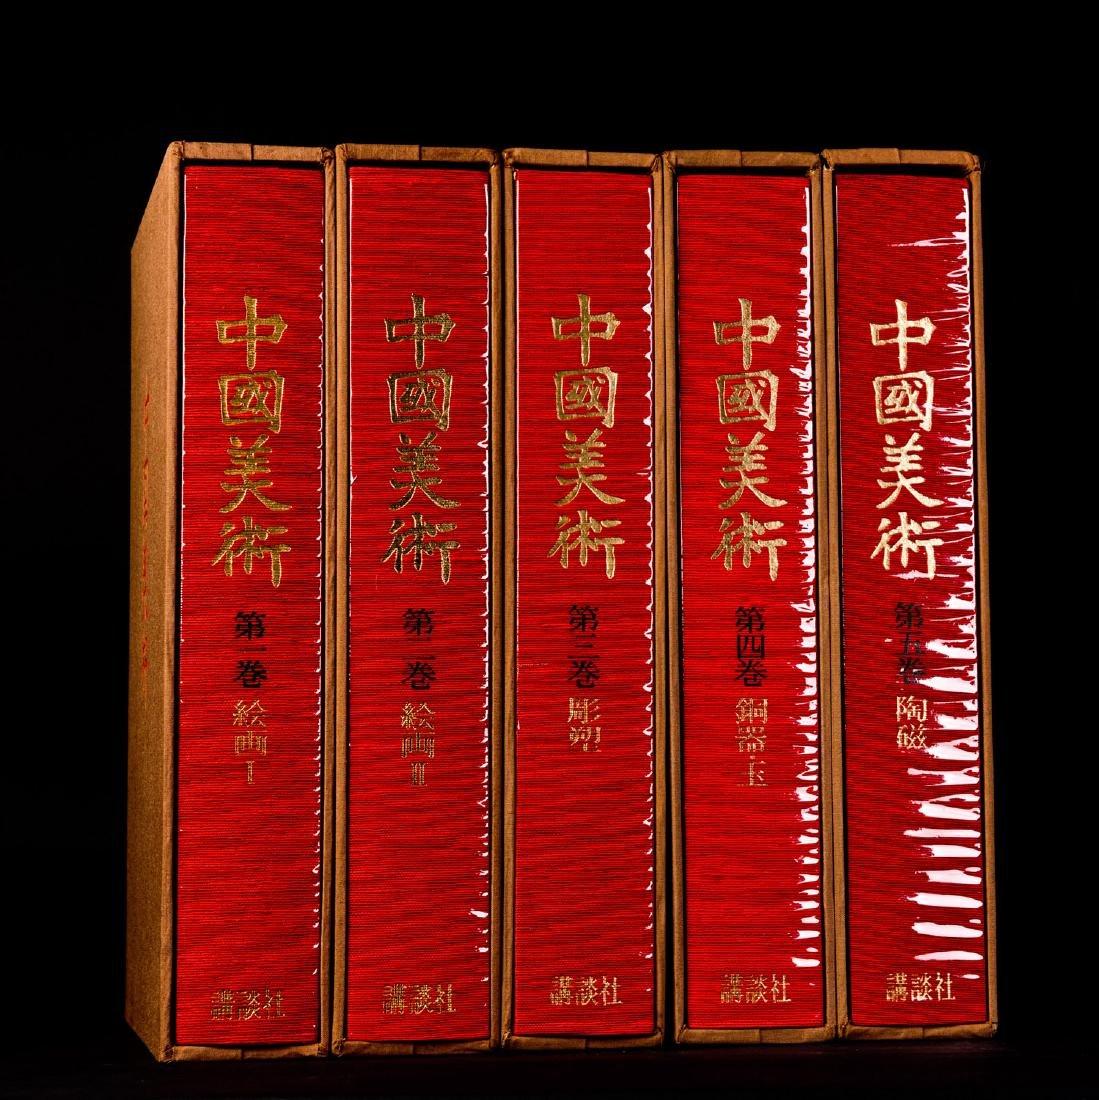 5-VOLUME SET OF BOOKS ON CHINESE ARTWORKS